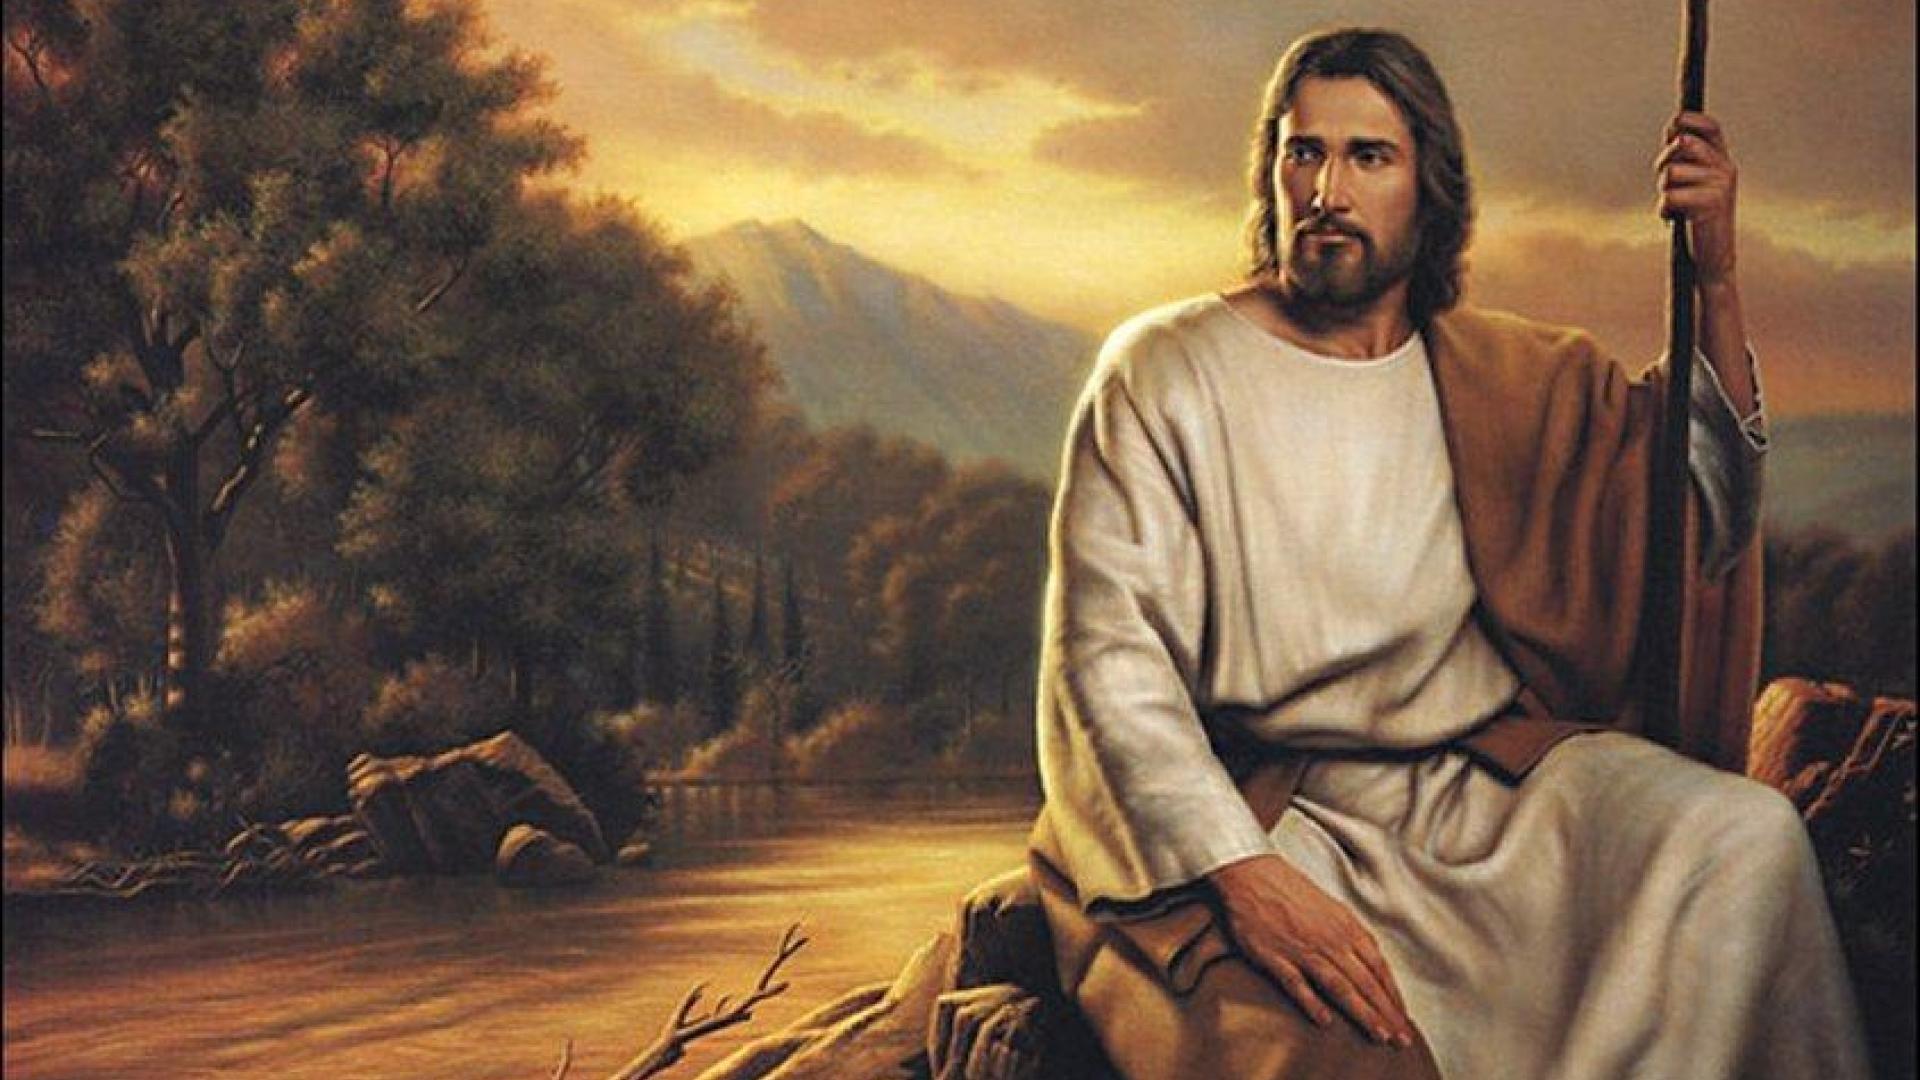 Christ Wallpaper 1